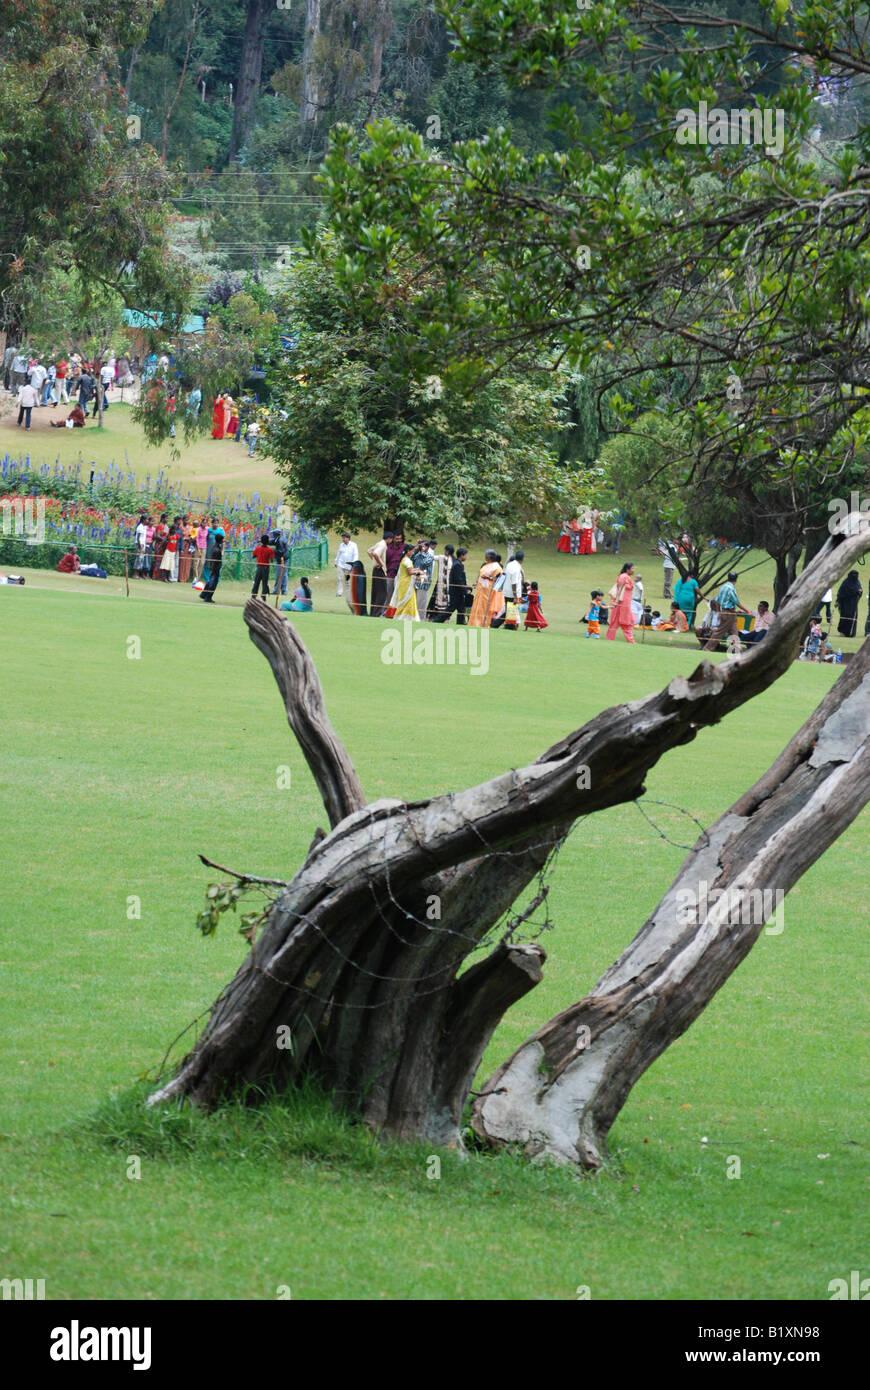 the beautyfull view from -otty,tamilnadu india - Stock Image